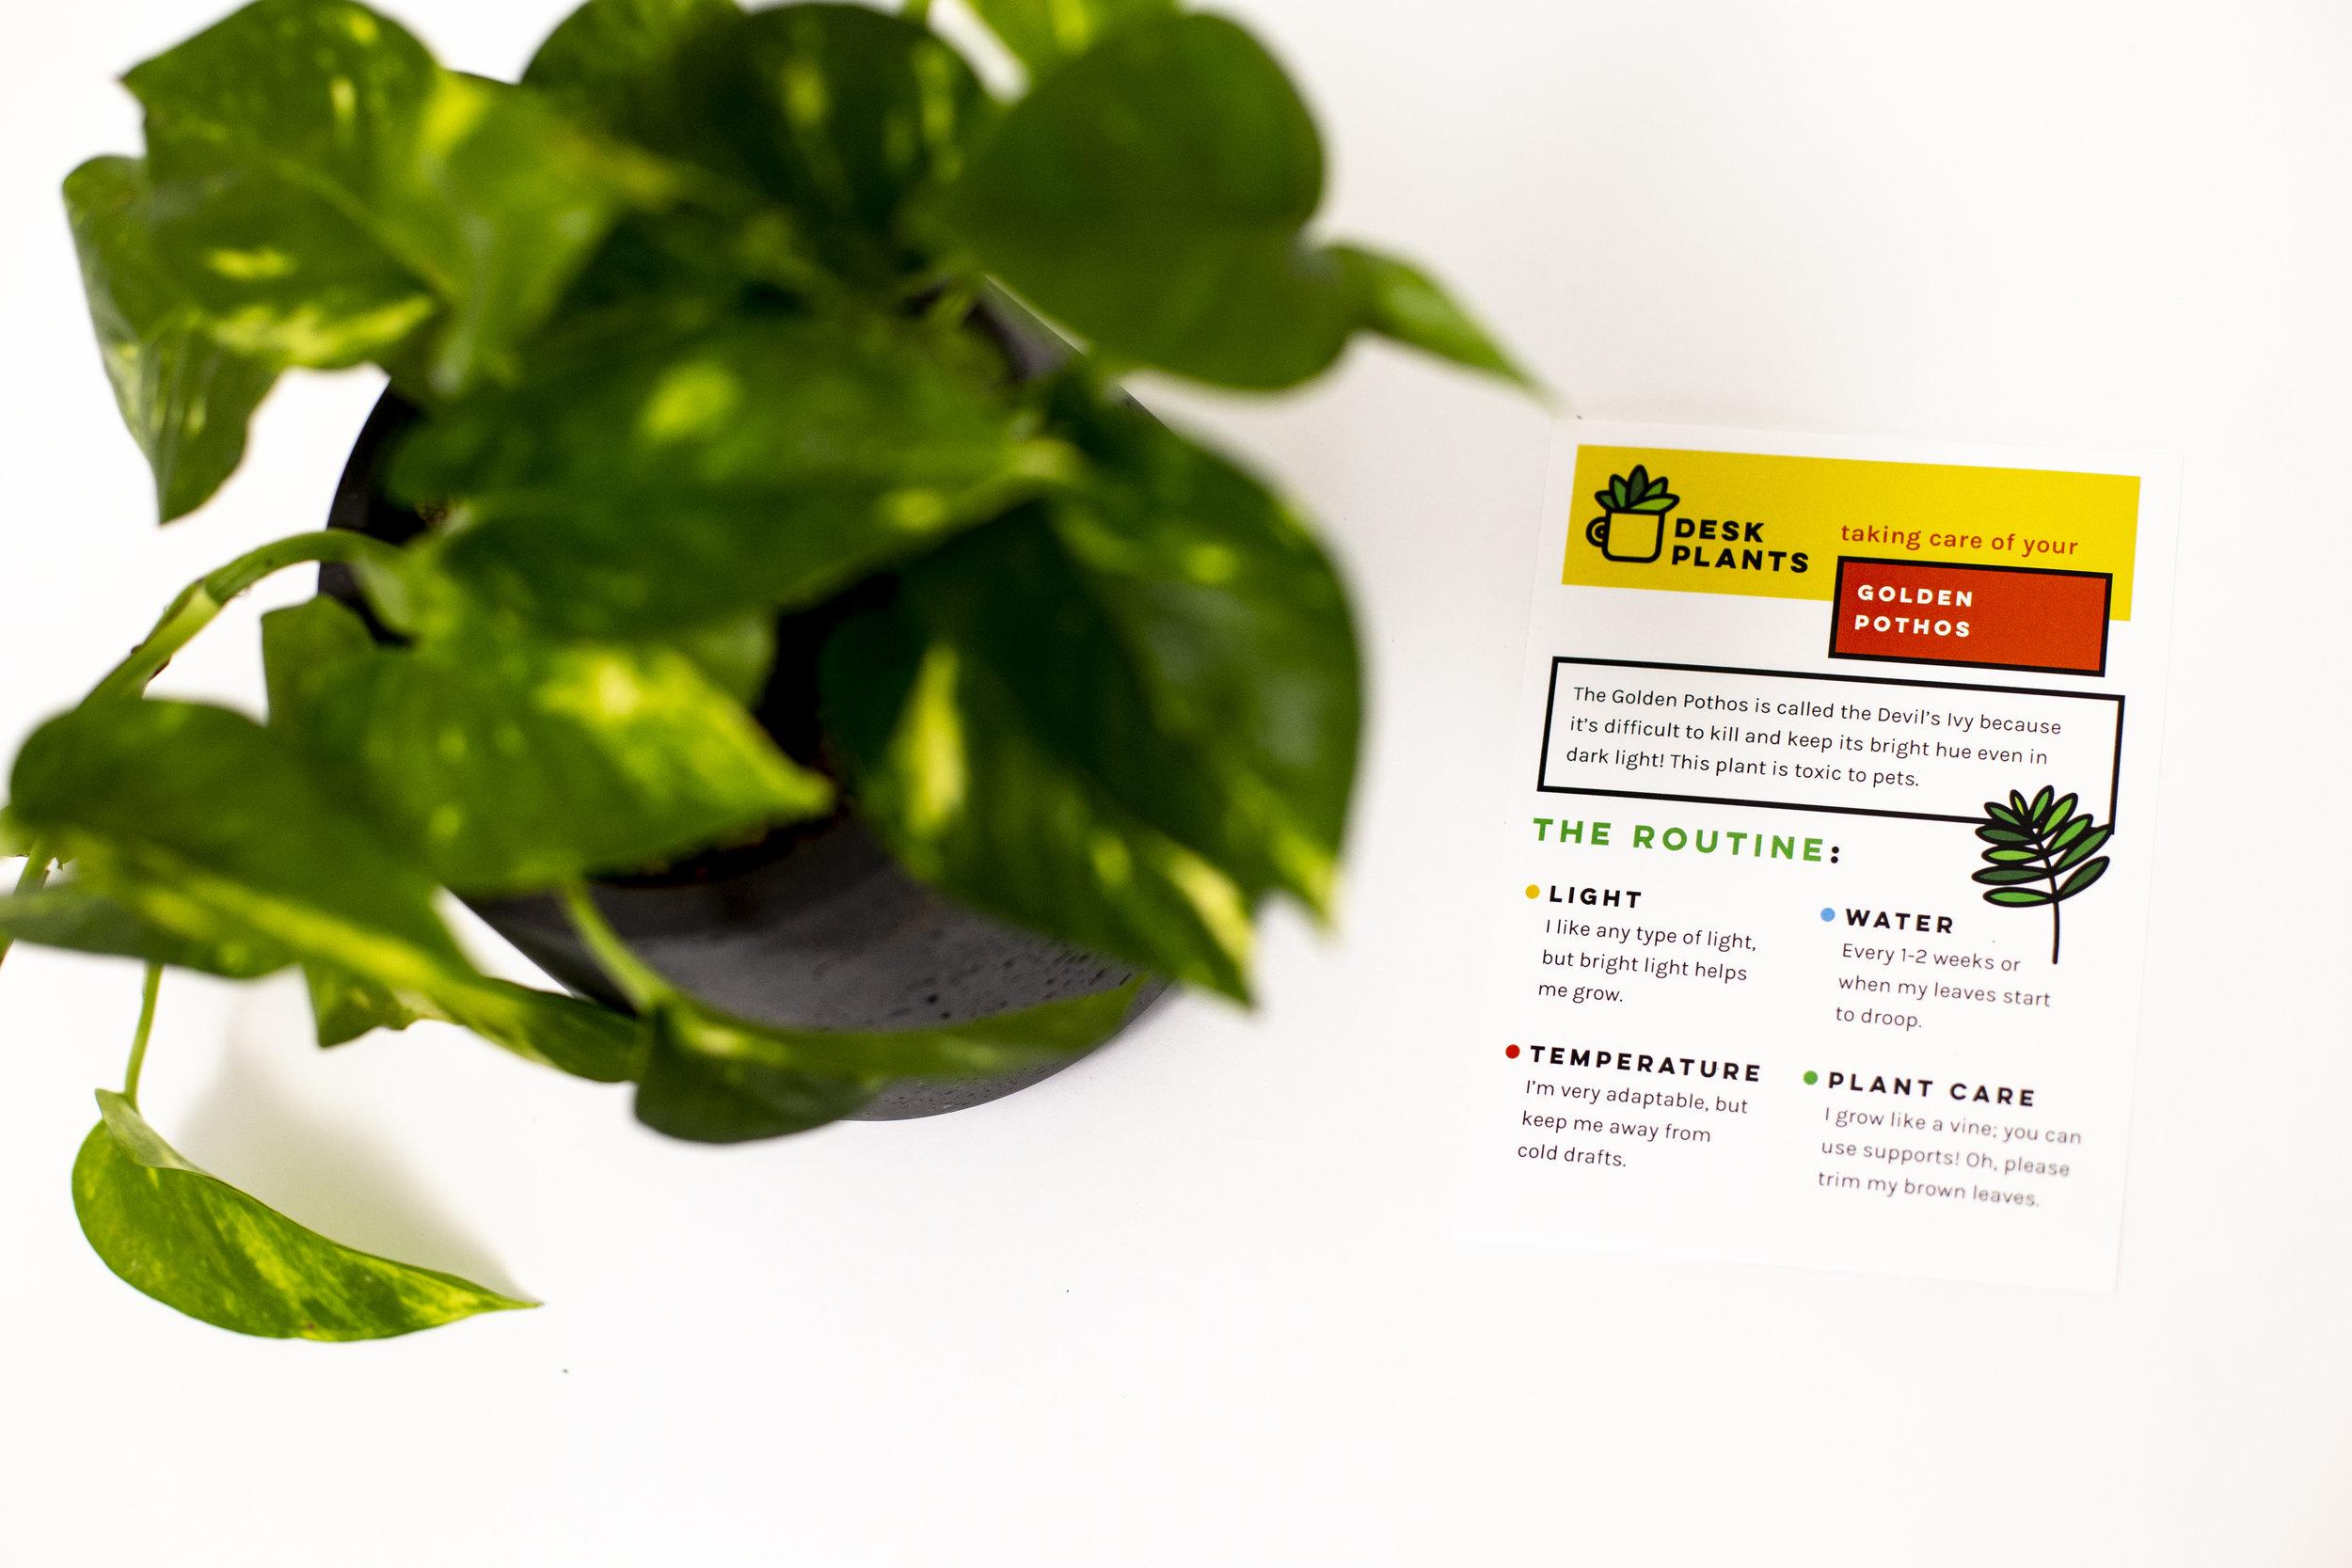 deskplants6544.jpg